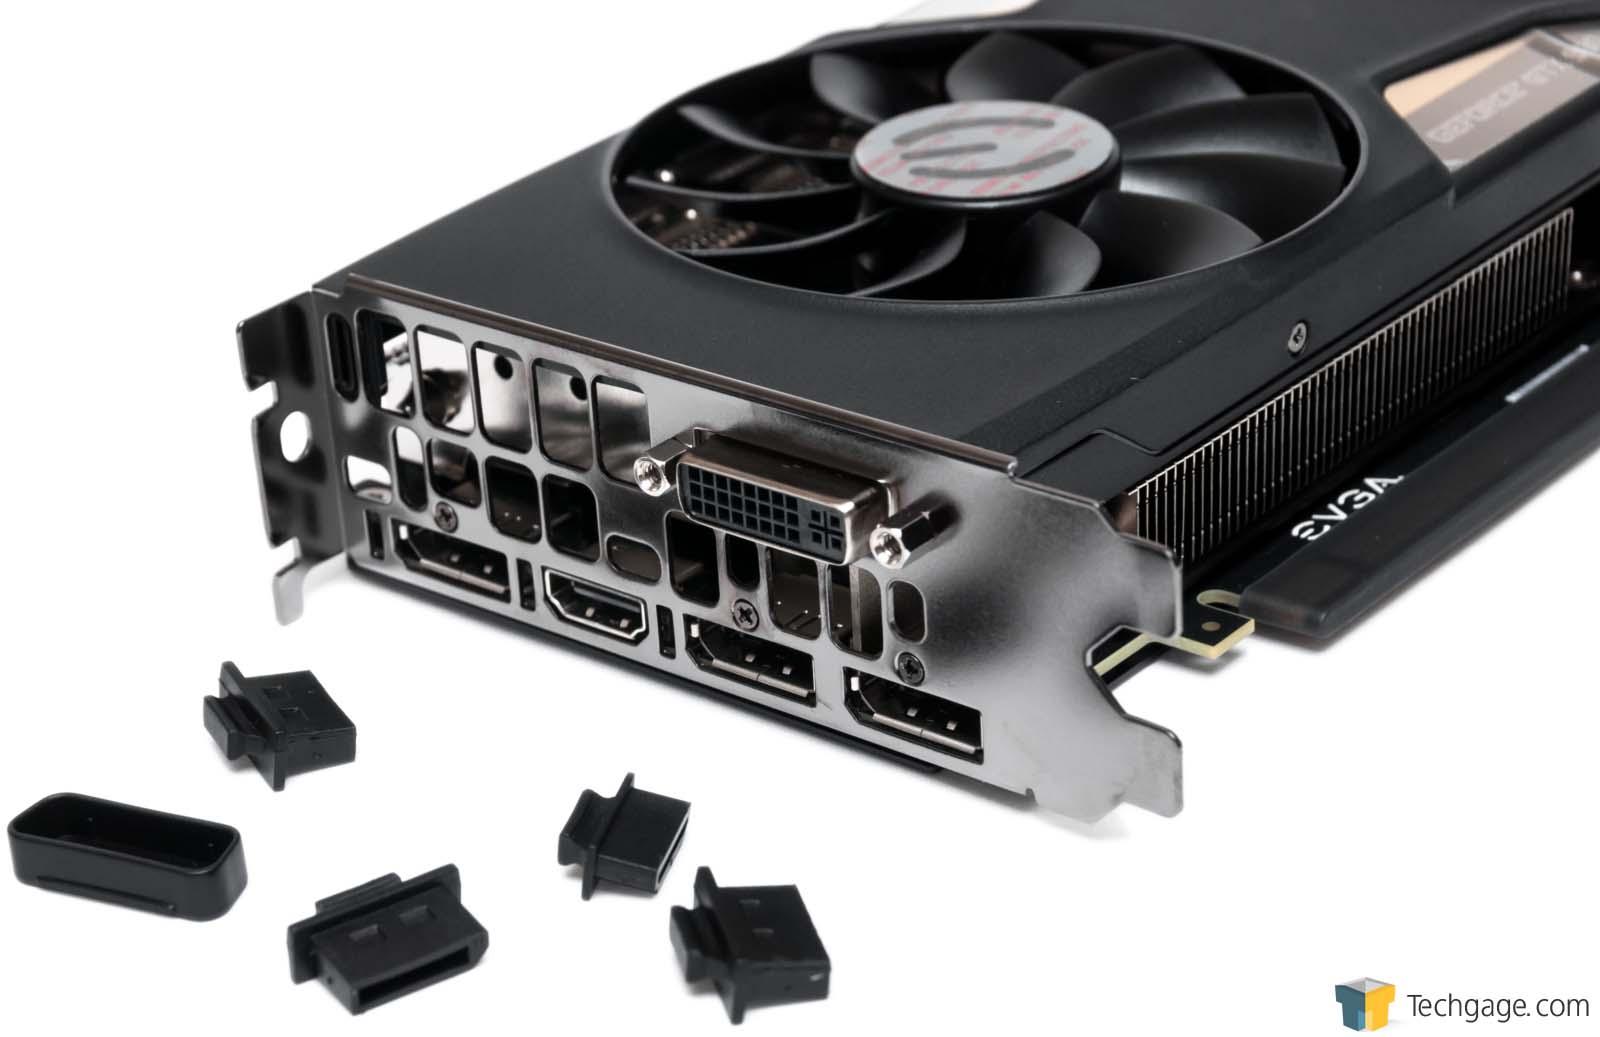 Evga Geforce Gtx 980 Ti Ftw Video Connectors Techgage